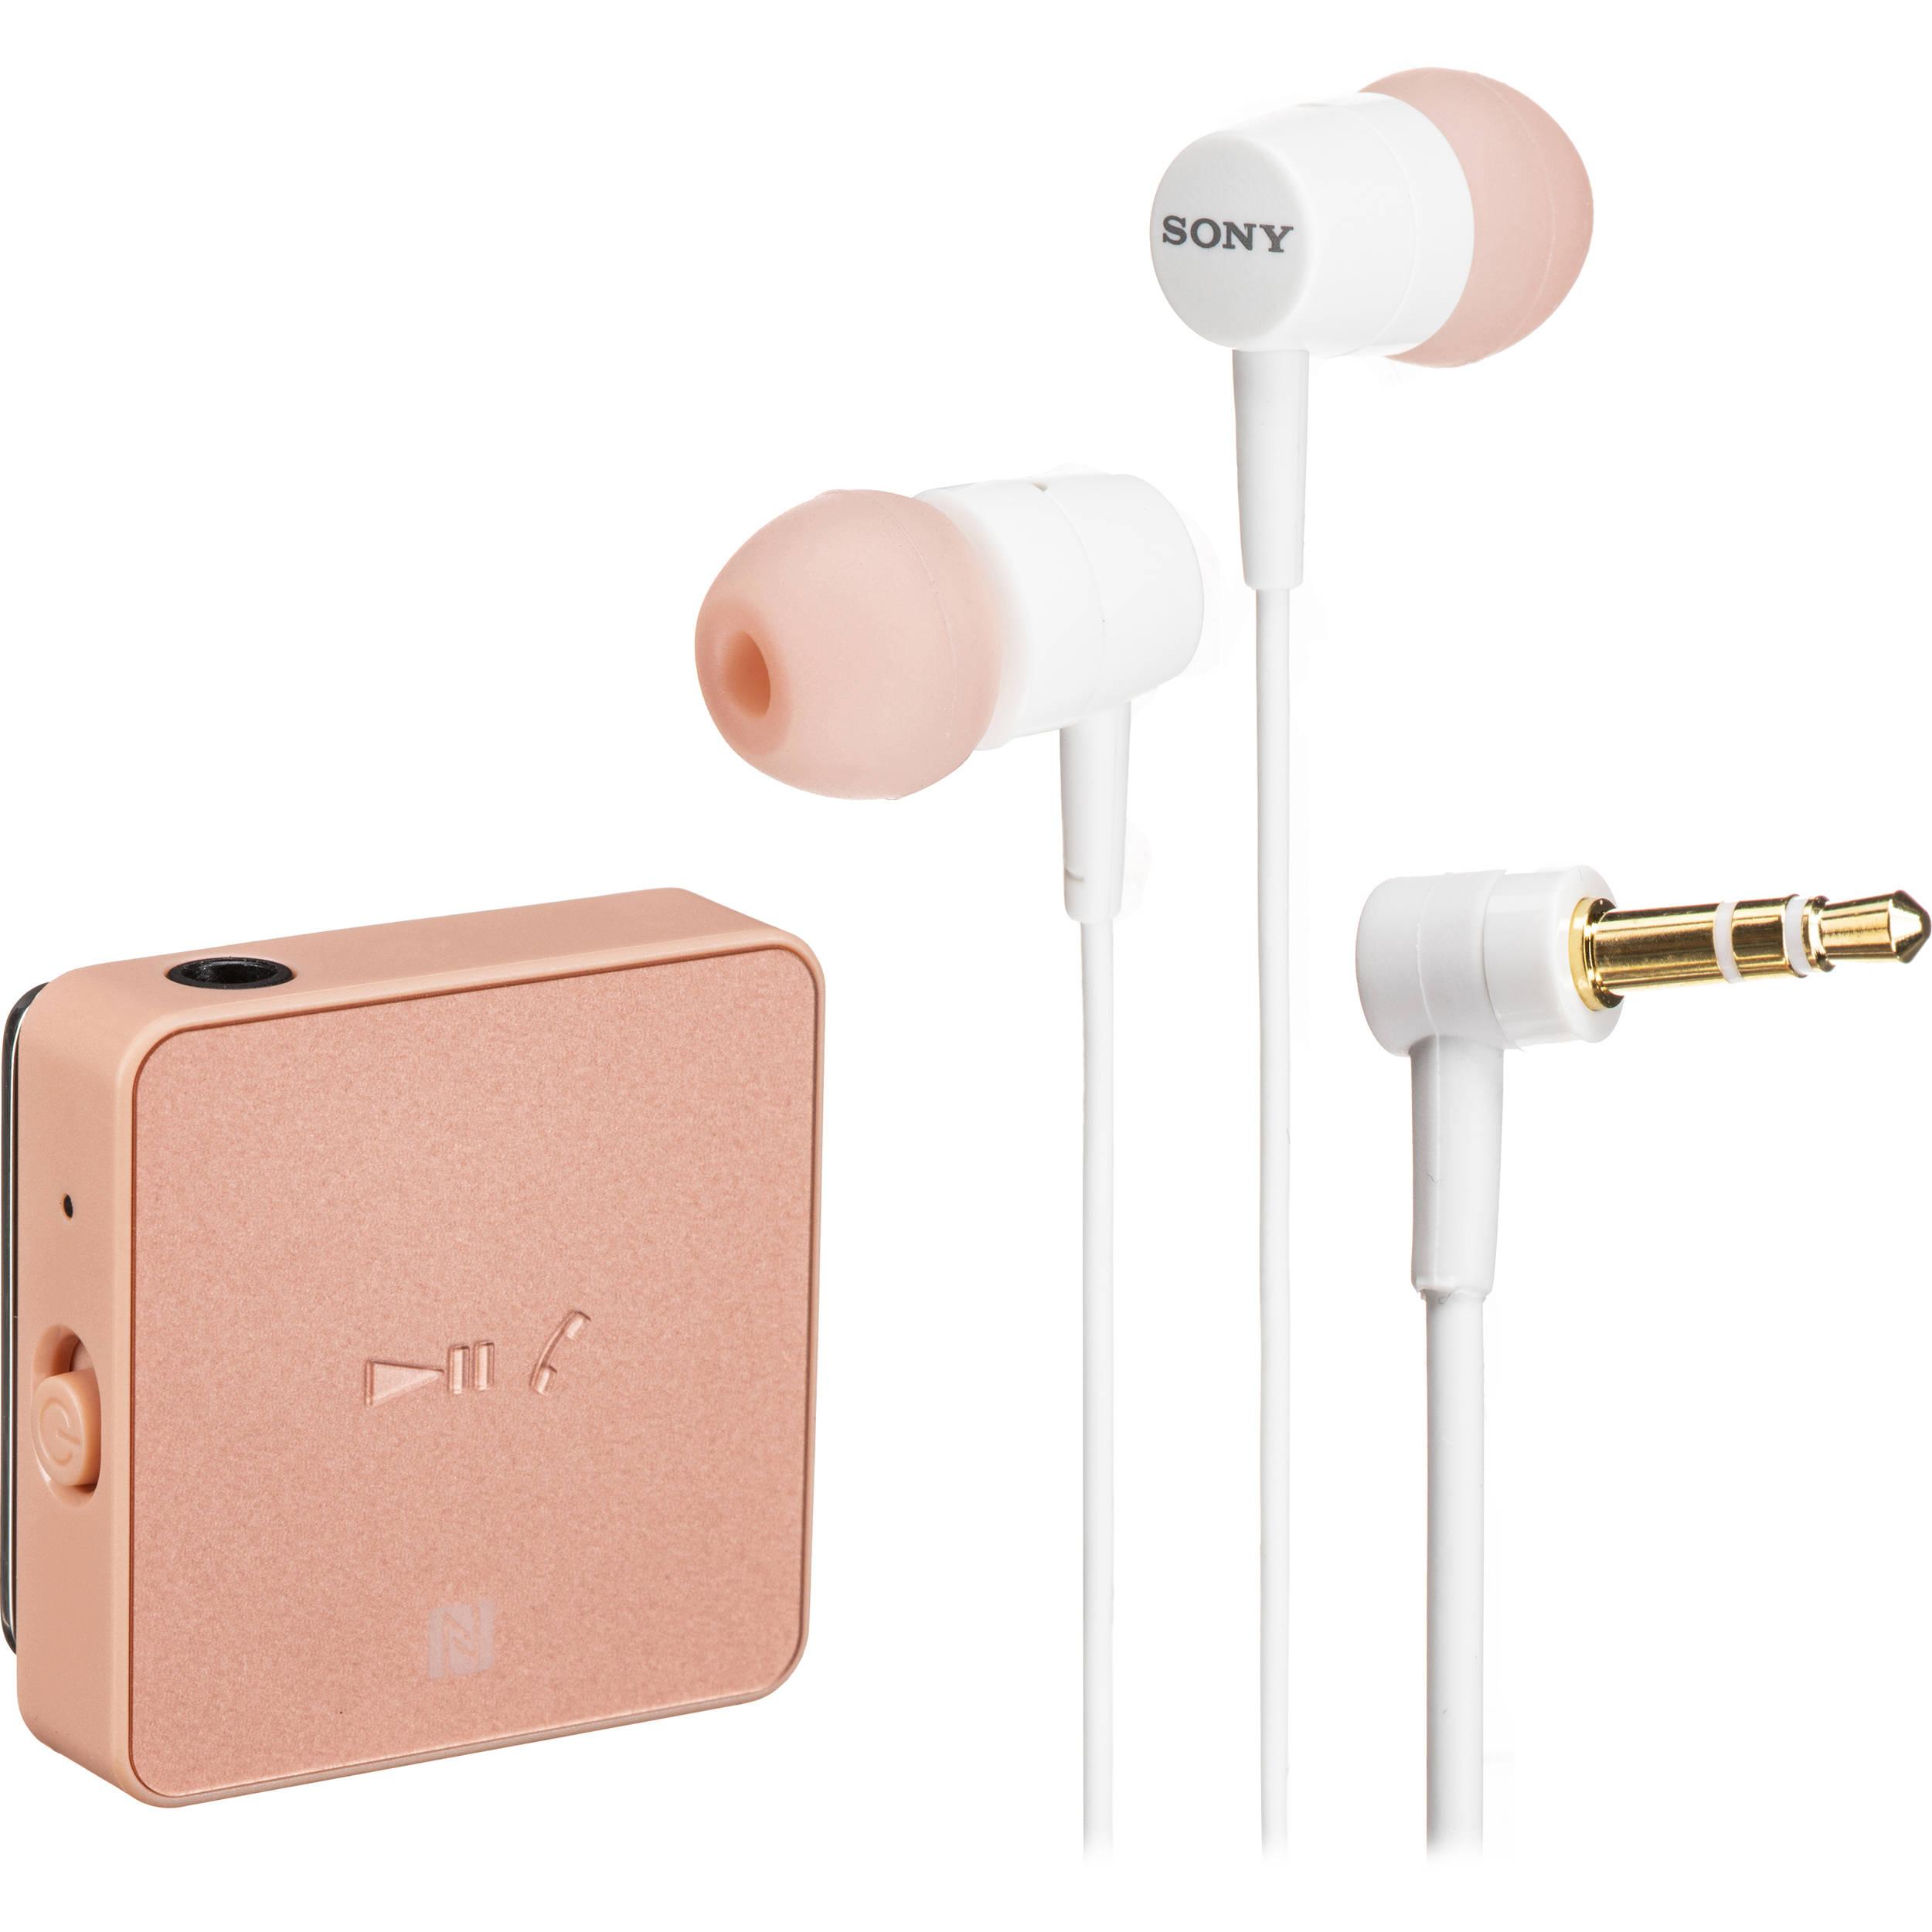 Sony Sbh24 Clip Style Bluetooth Headset 1309 5294 B H Photo Video